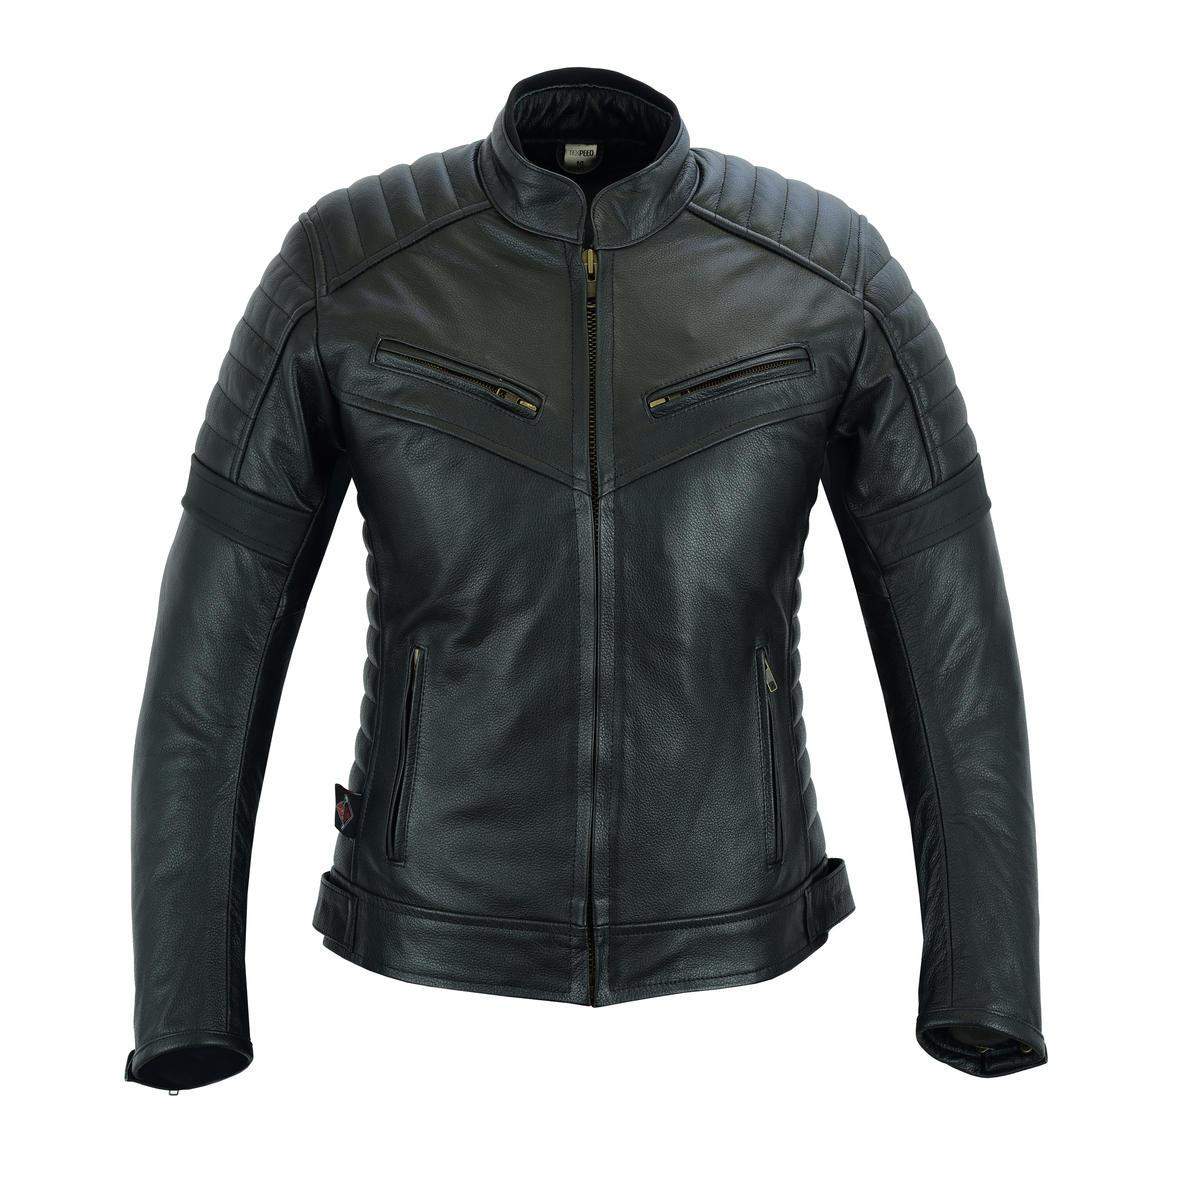 Ladies Black Leather Touring Motorcycle Jacket